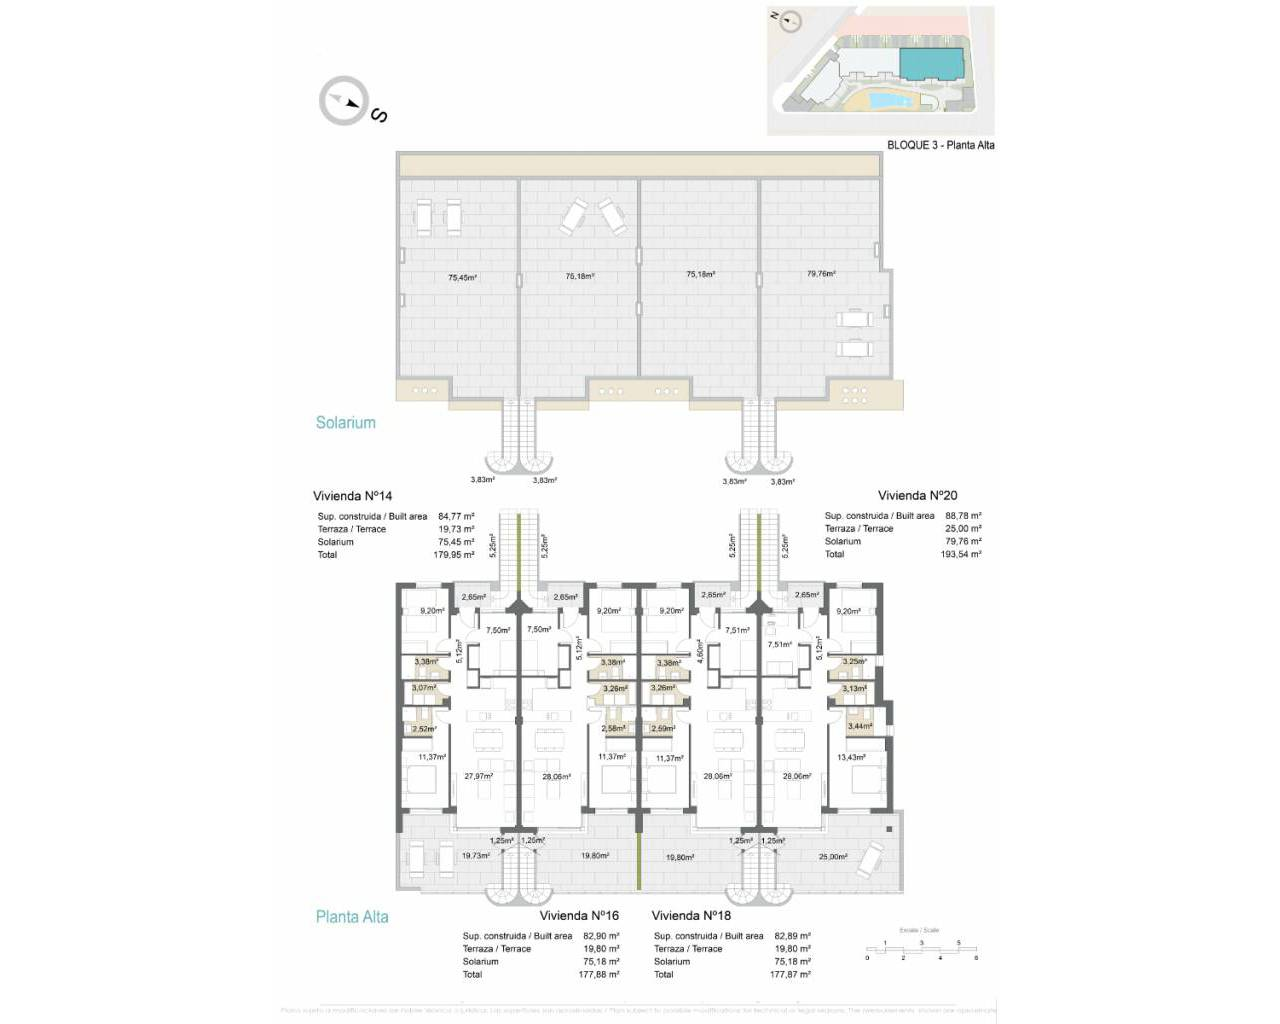 nieuwbouw-appartement-pilar-de-la-horadada_5792_xl